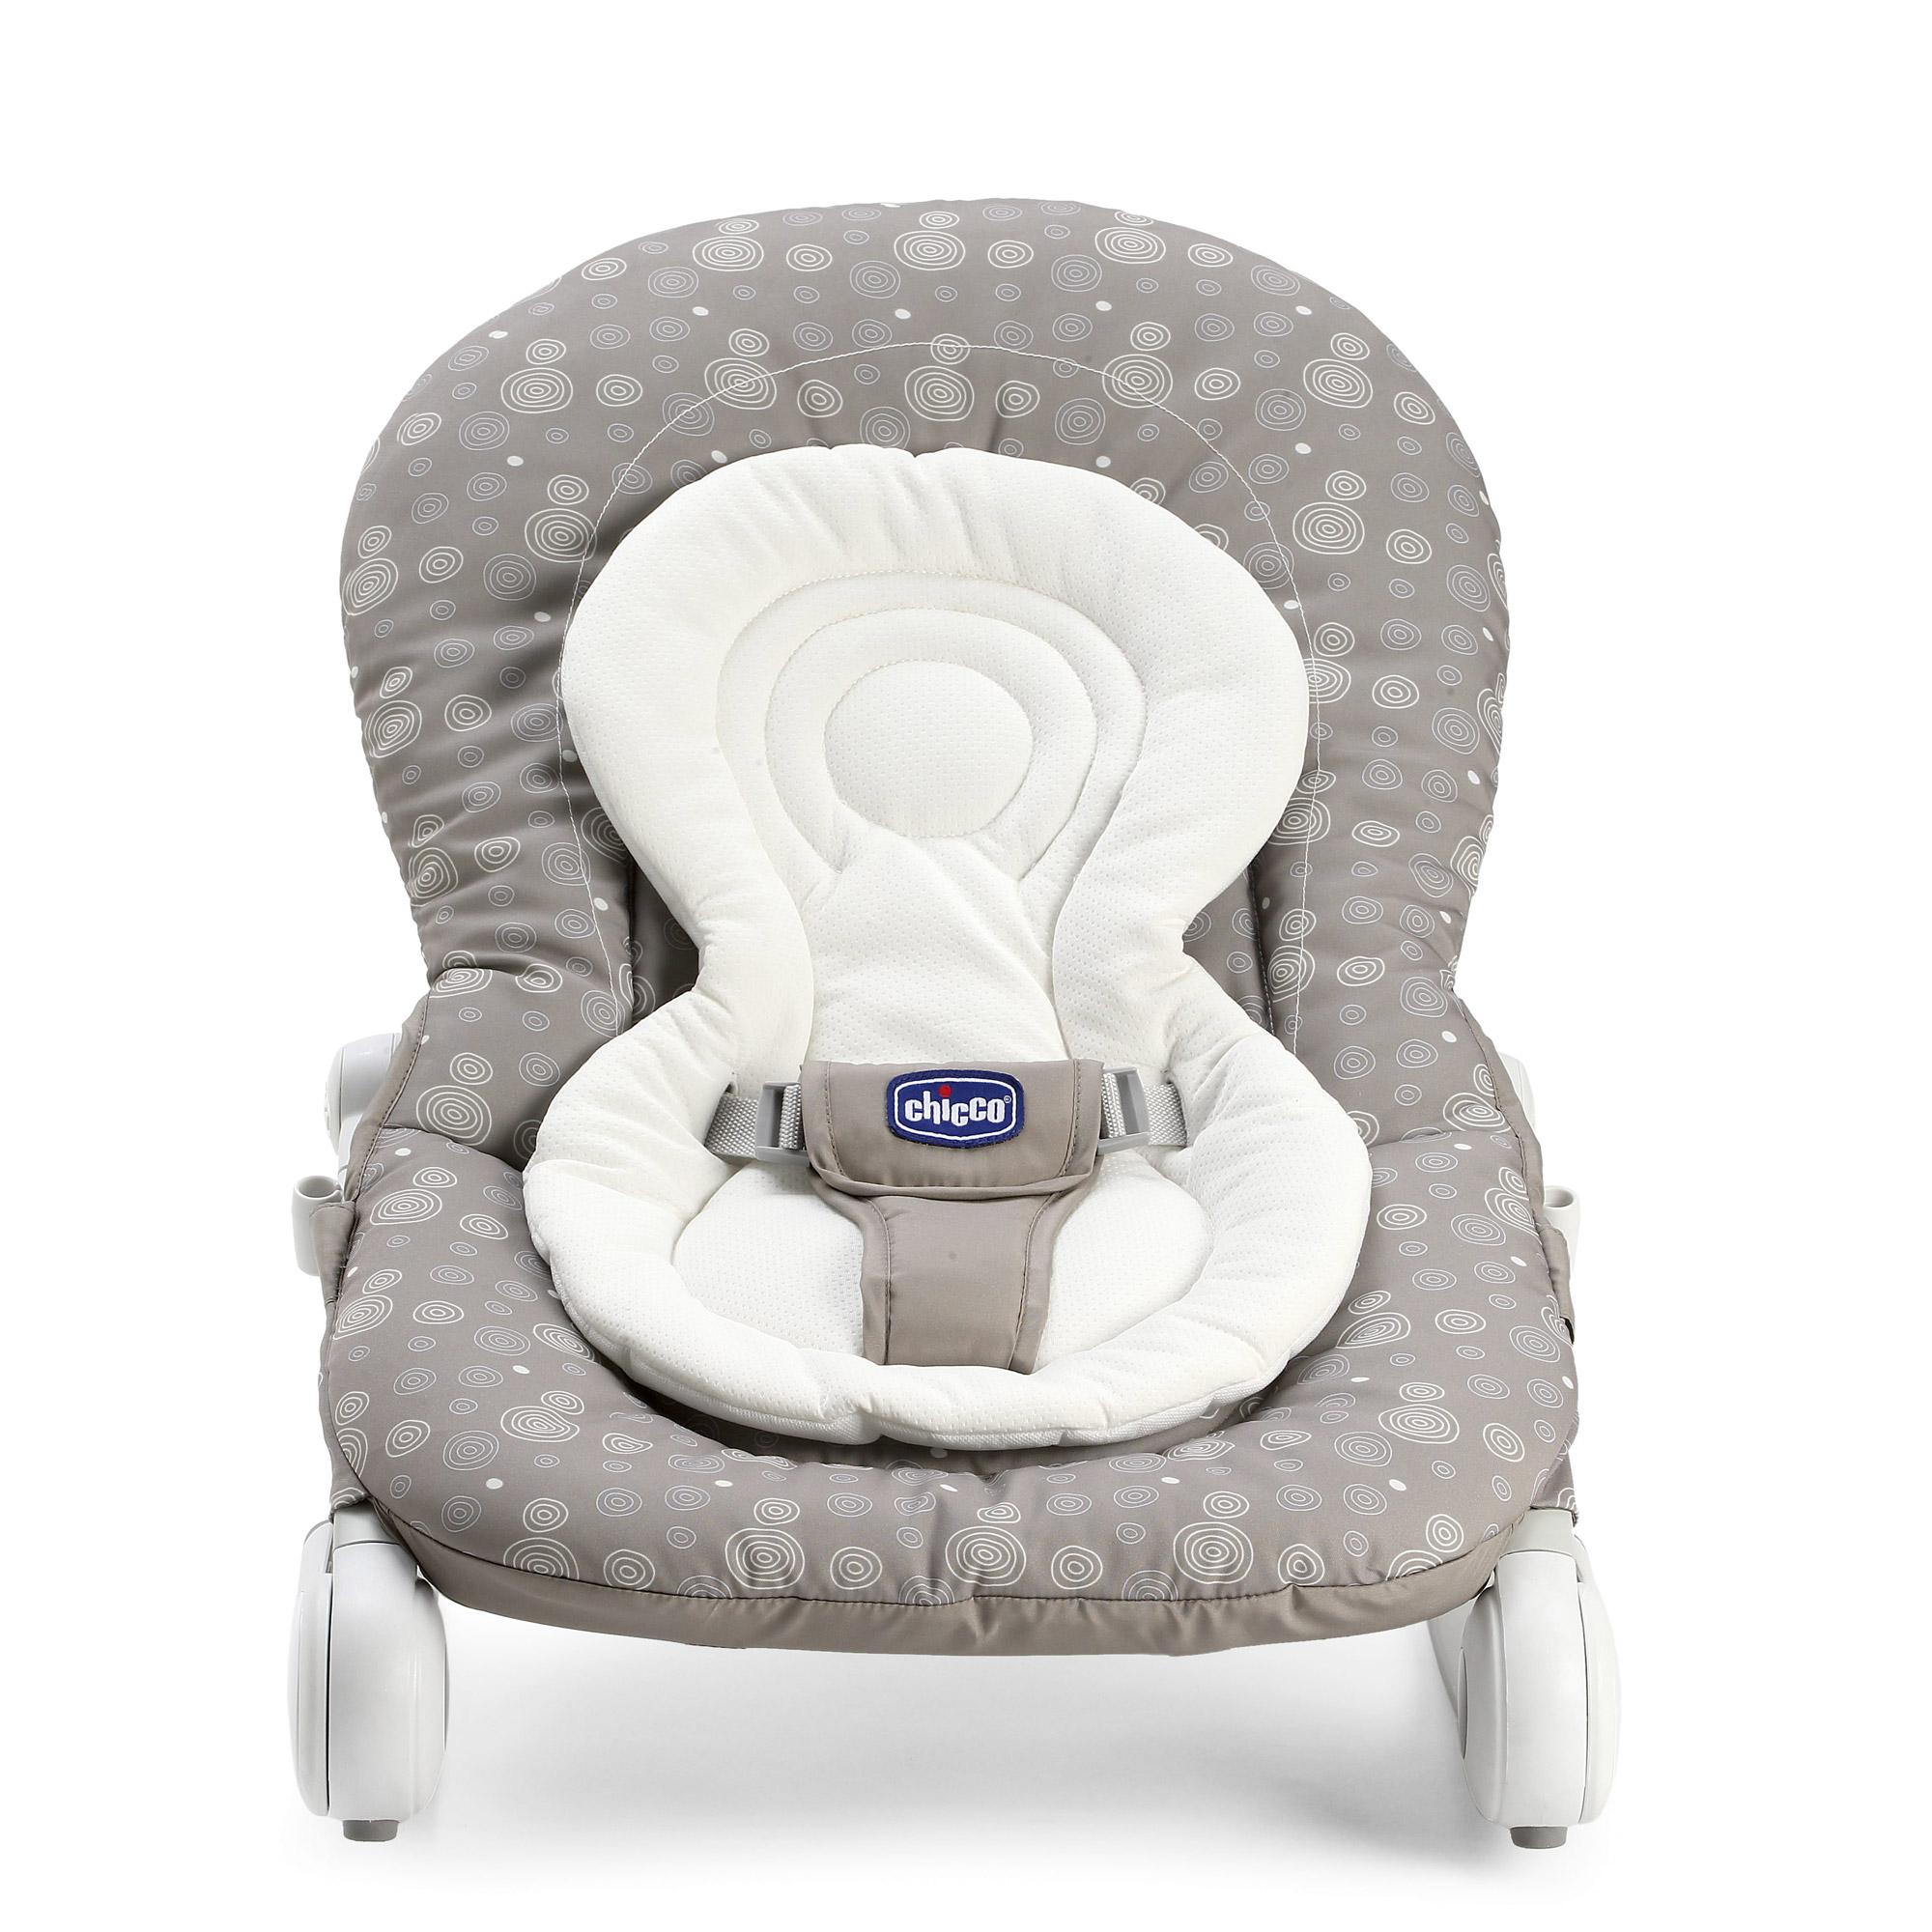 transat hoopla legend de chicco chicco aubert. Black Bedroom Furniture Sets. Home Design Ideas